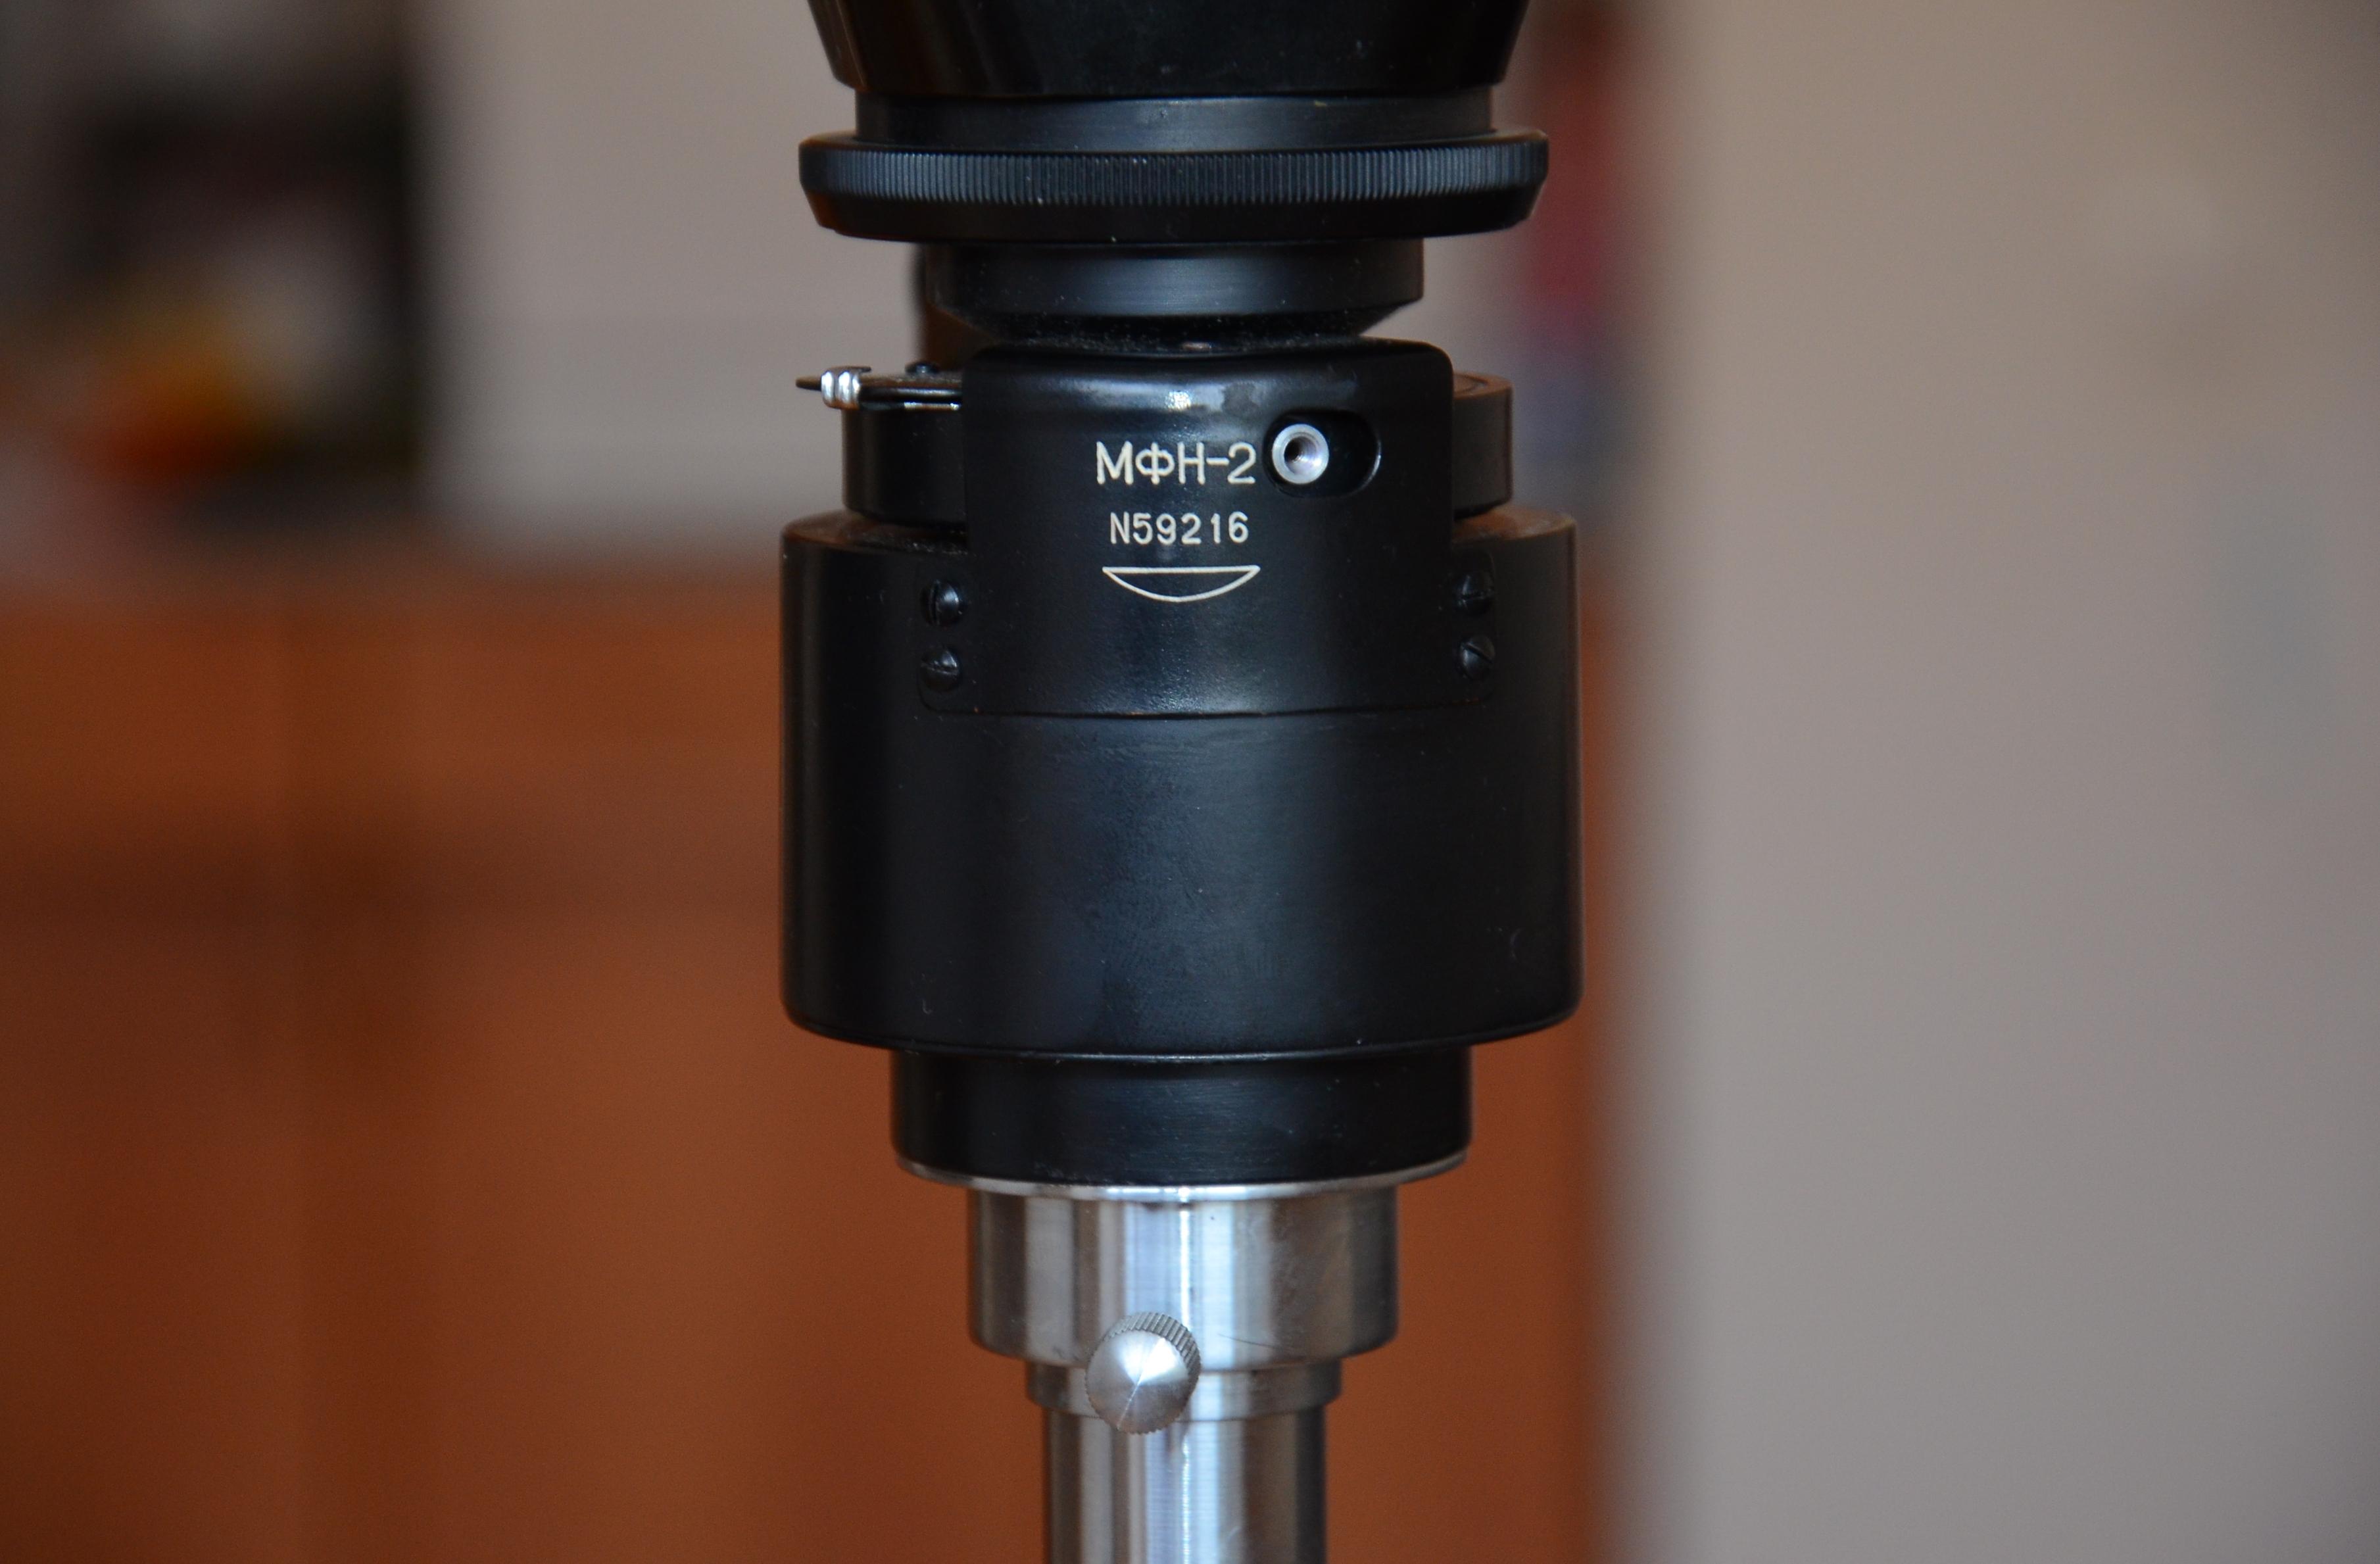 микрофотонасадка мфн-2